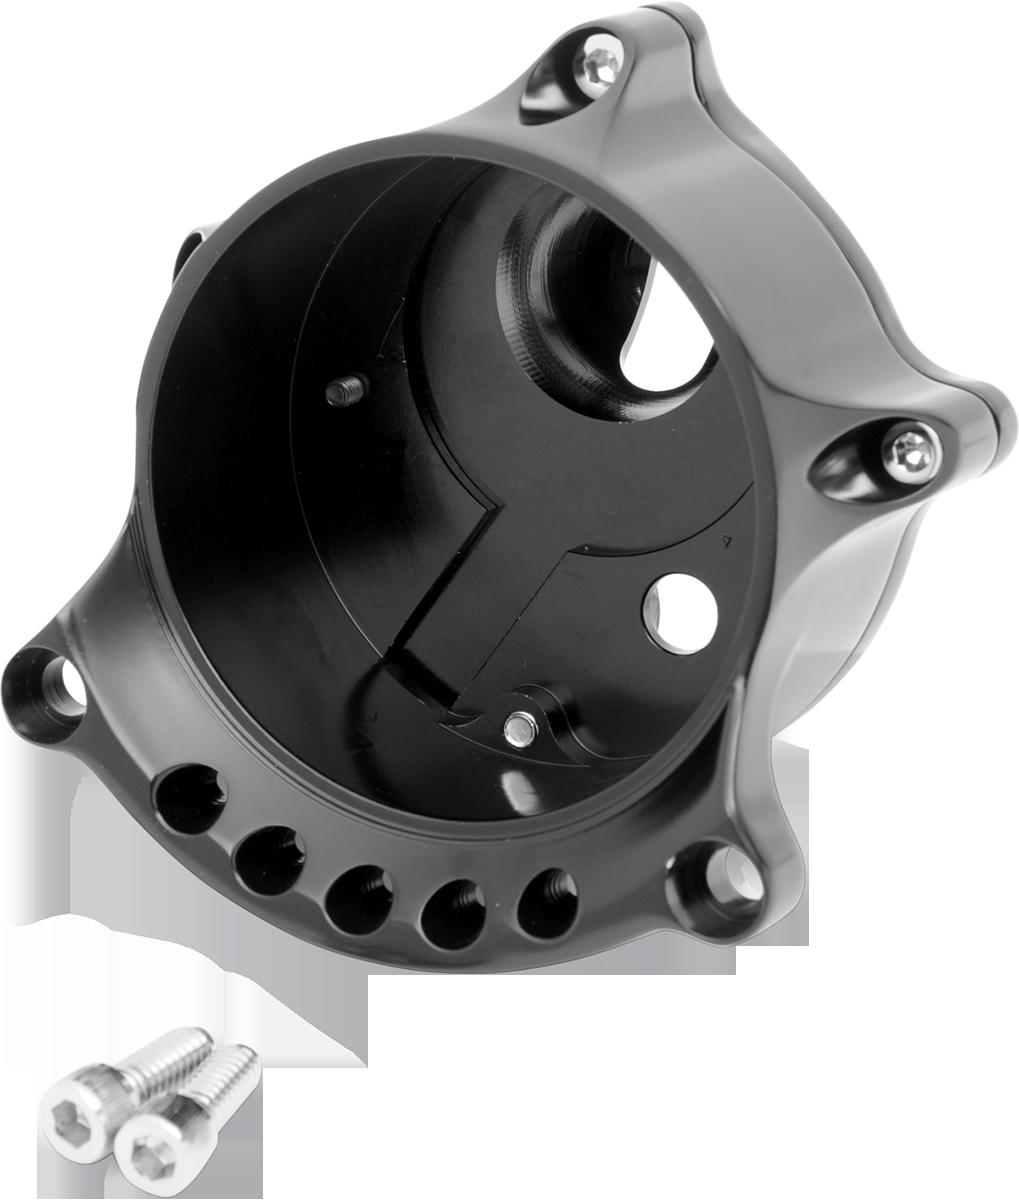 RSD Black Cafe Speeo Speedometer Mounting Bracket For 95-17 Harley Sportster XL